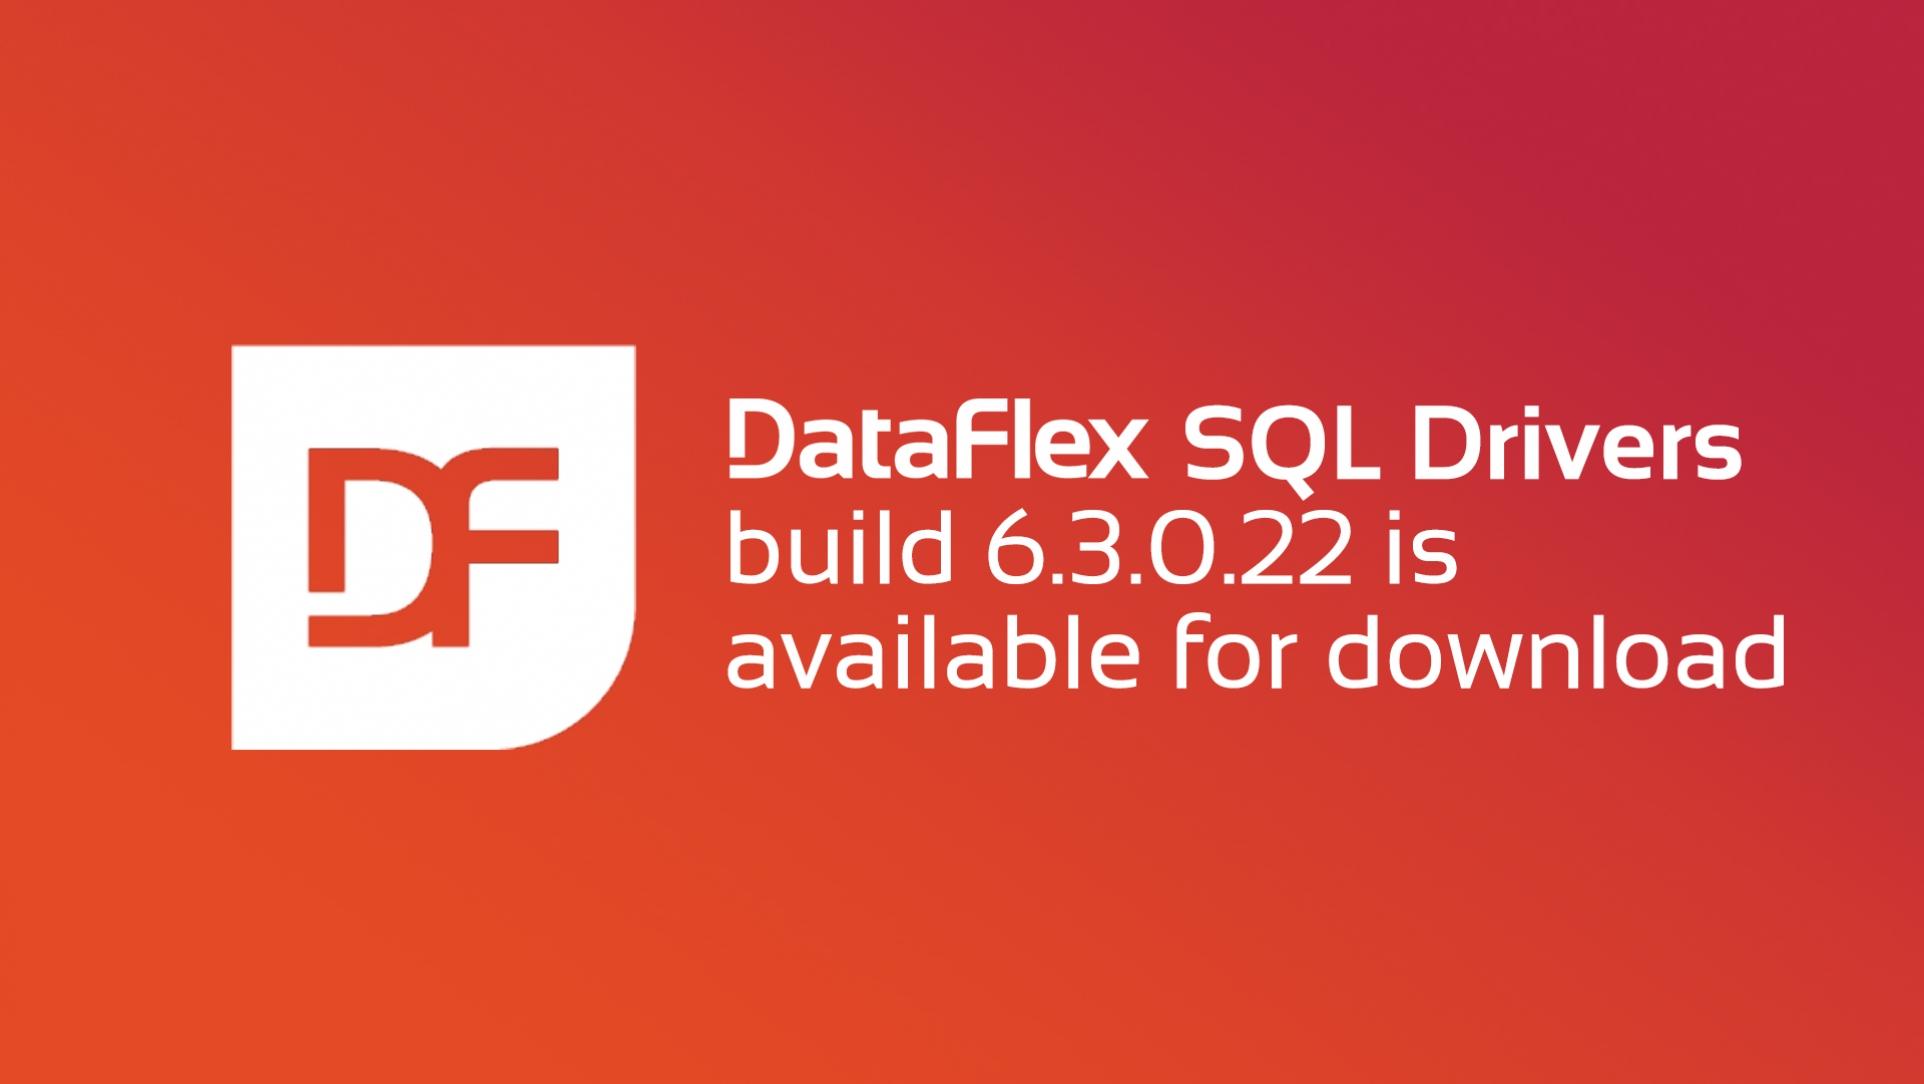 DataFlex SQL Drivers Updated